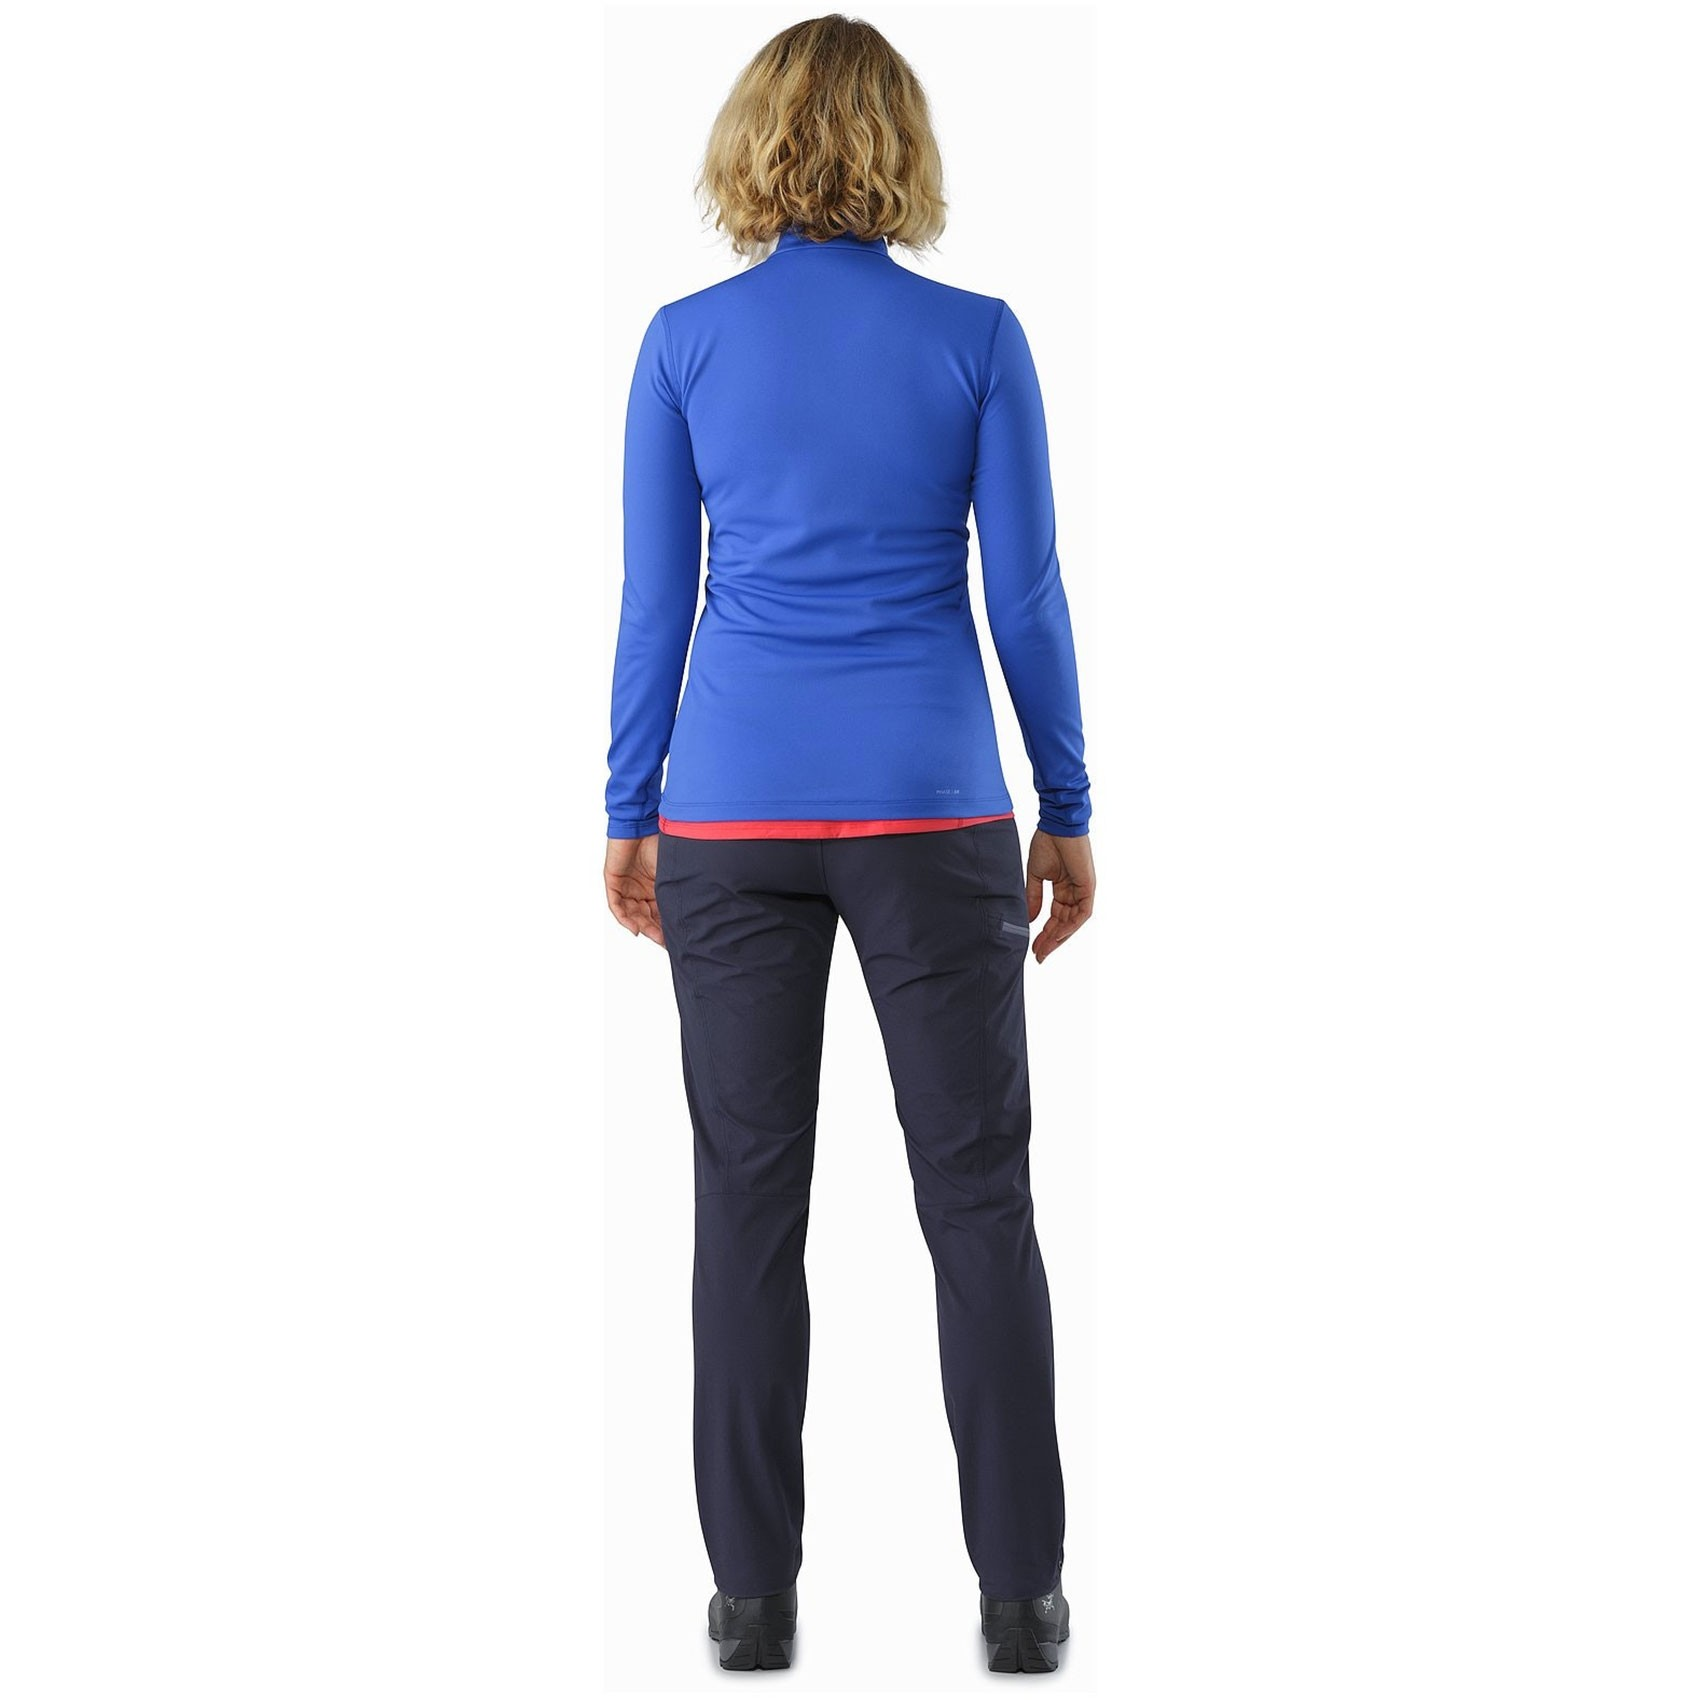 Arc'teryx Gamma LT Women's Softshell Pant - Black Sapphire - back view